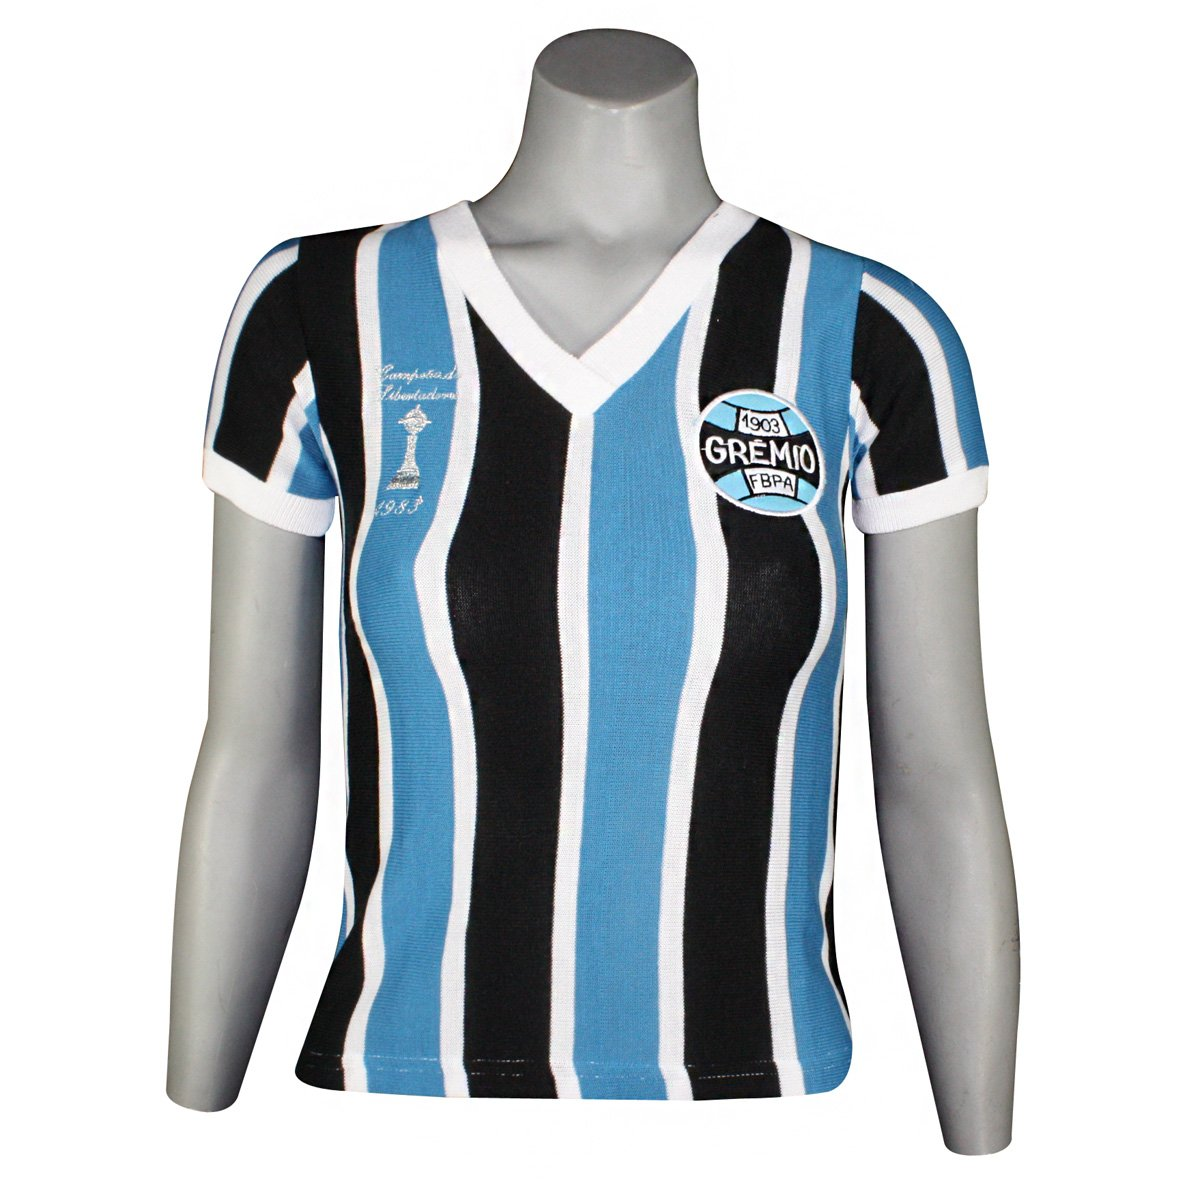 Camisa Feminina Dilva Oldoni Grêmio Retro Renato Gaúcho GLIBB Tricolor 8b230f30dcc4b